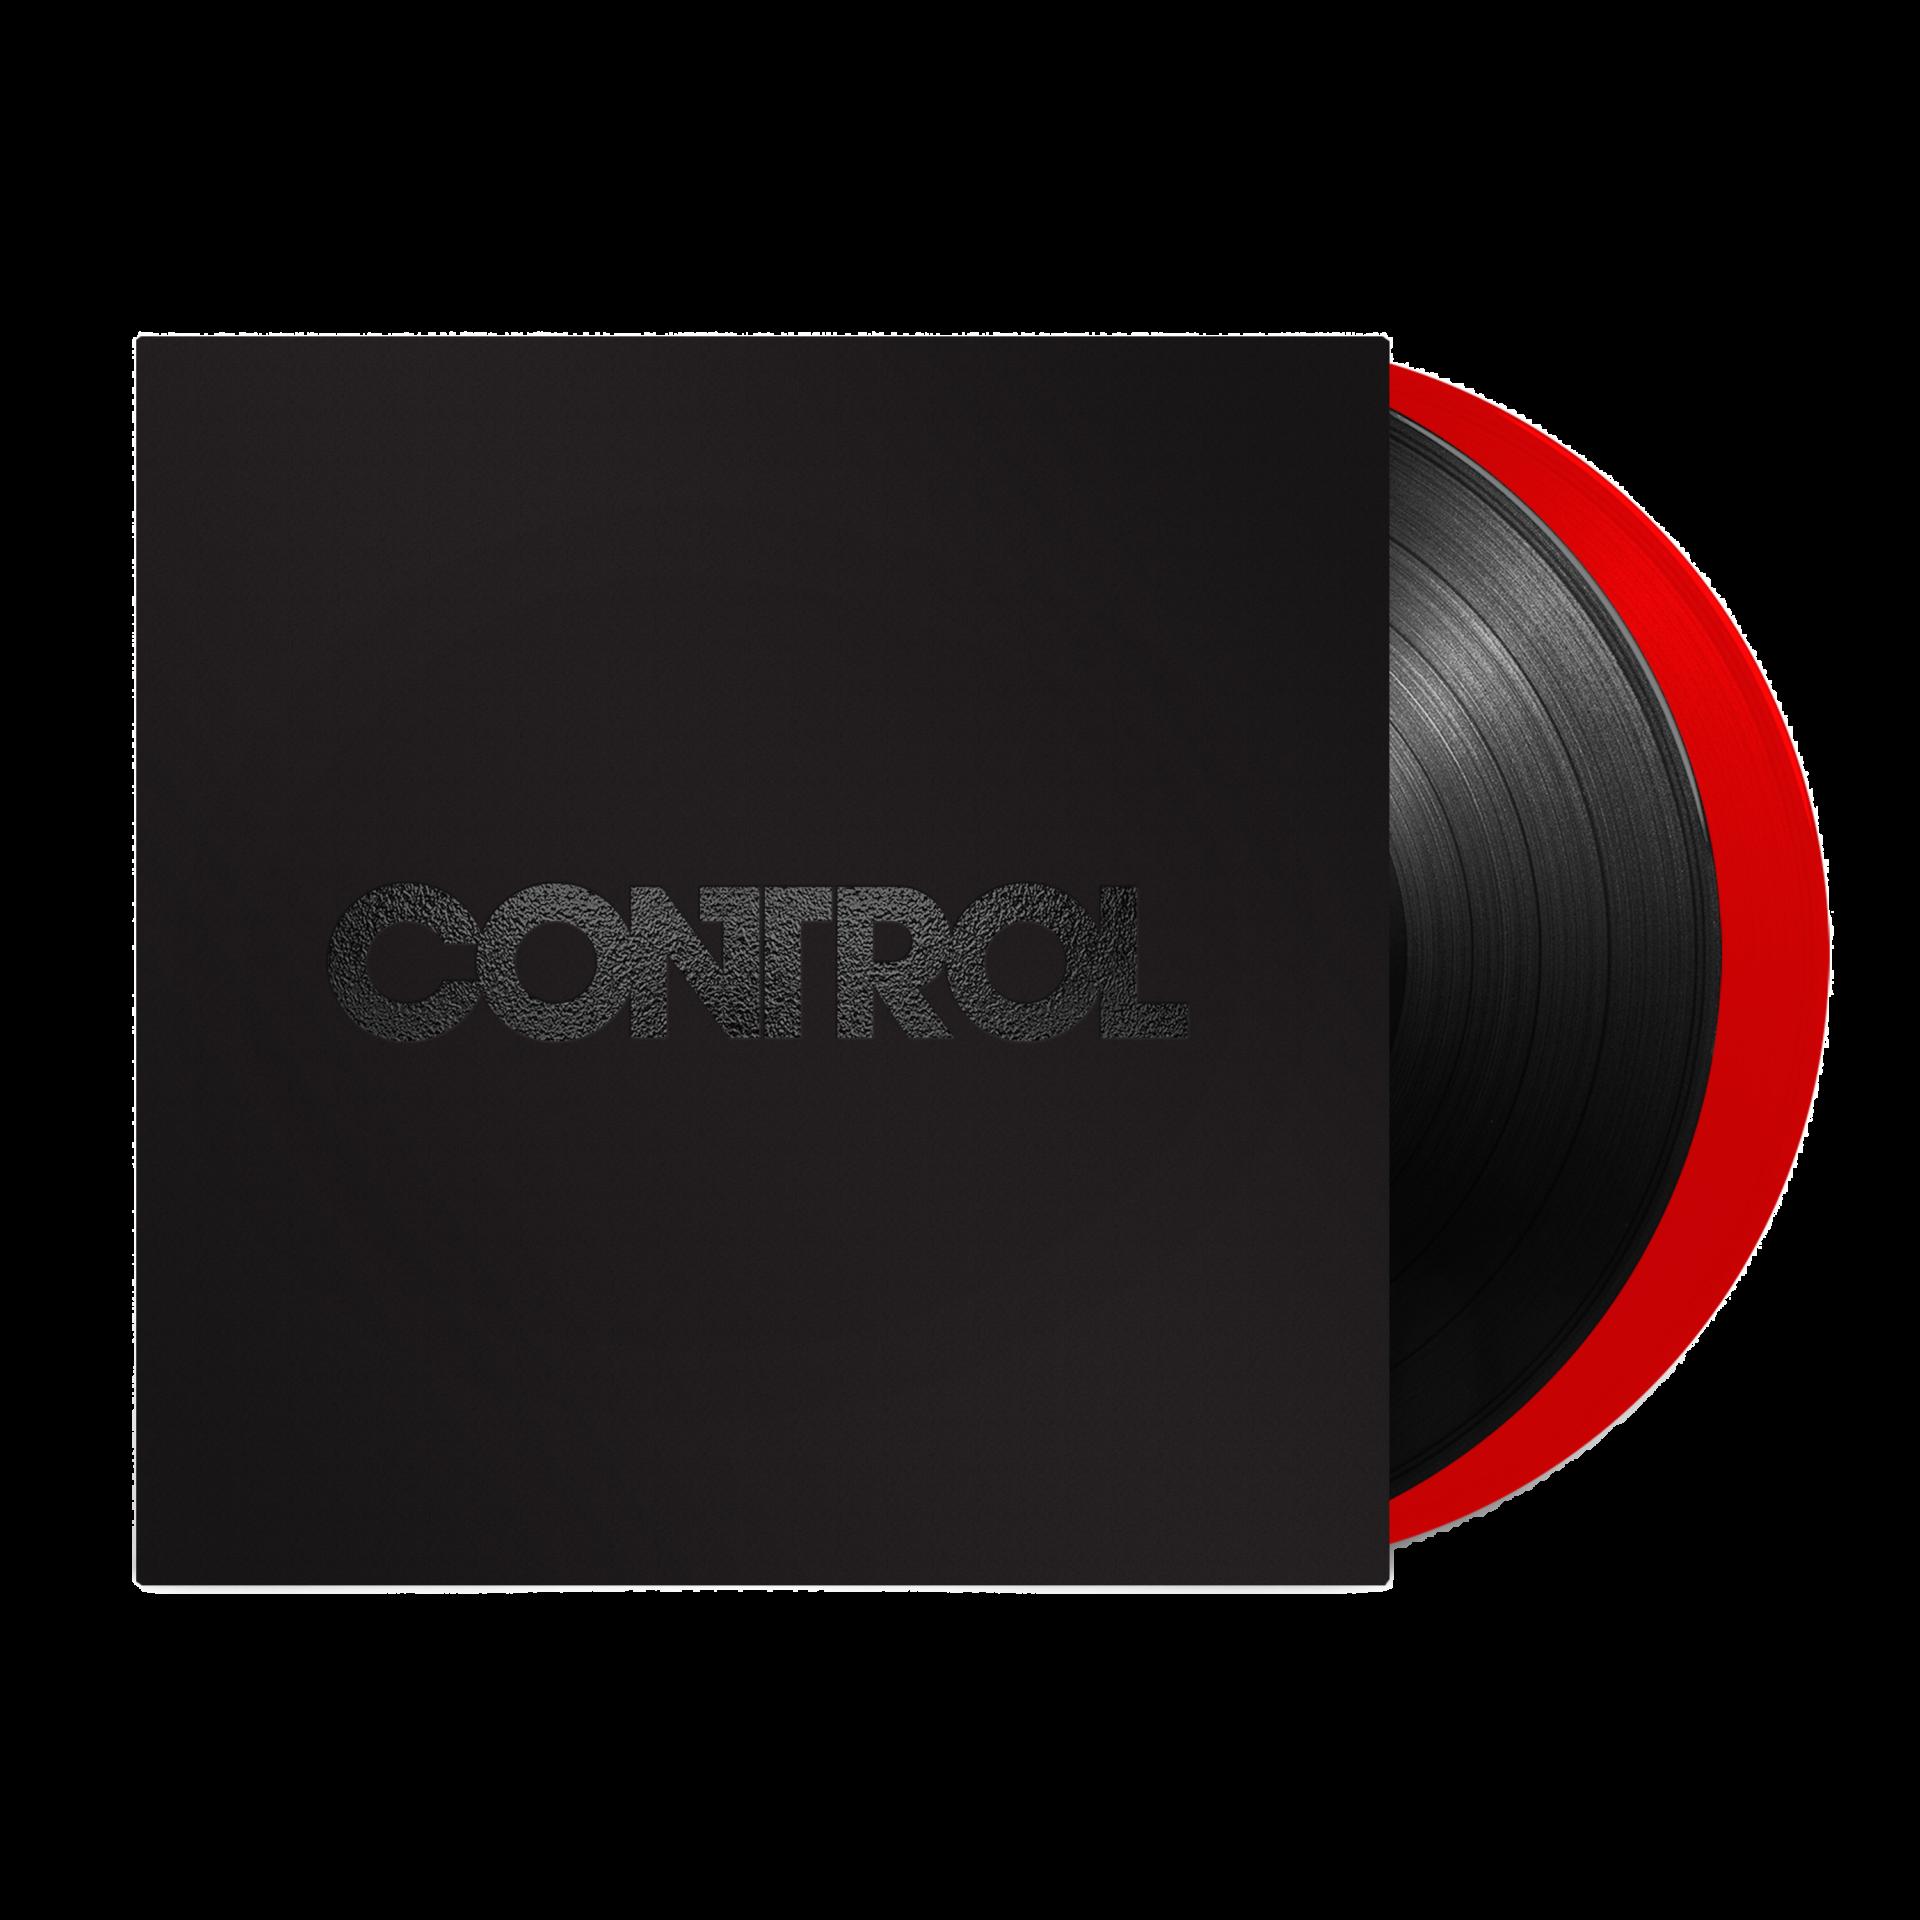 control1